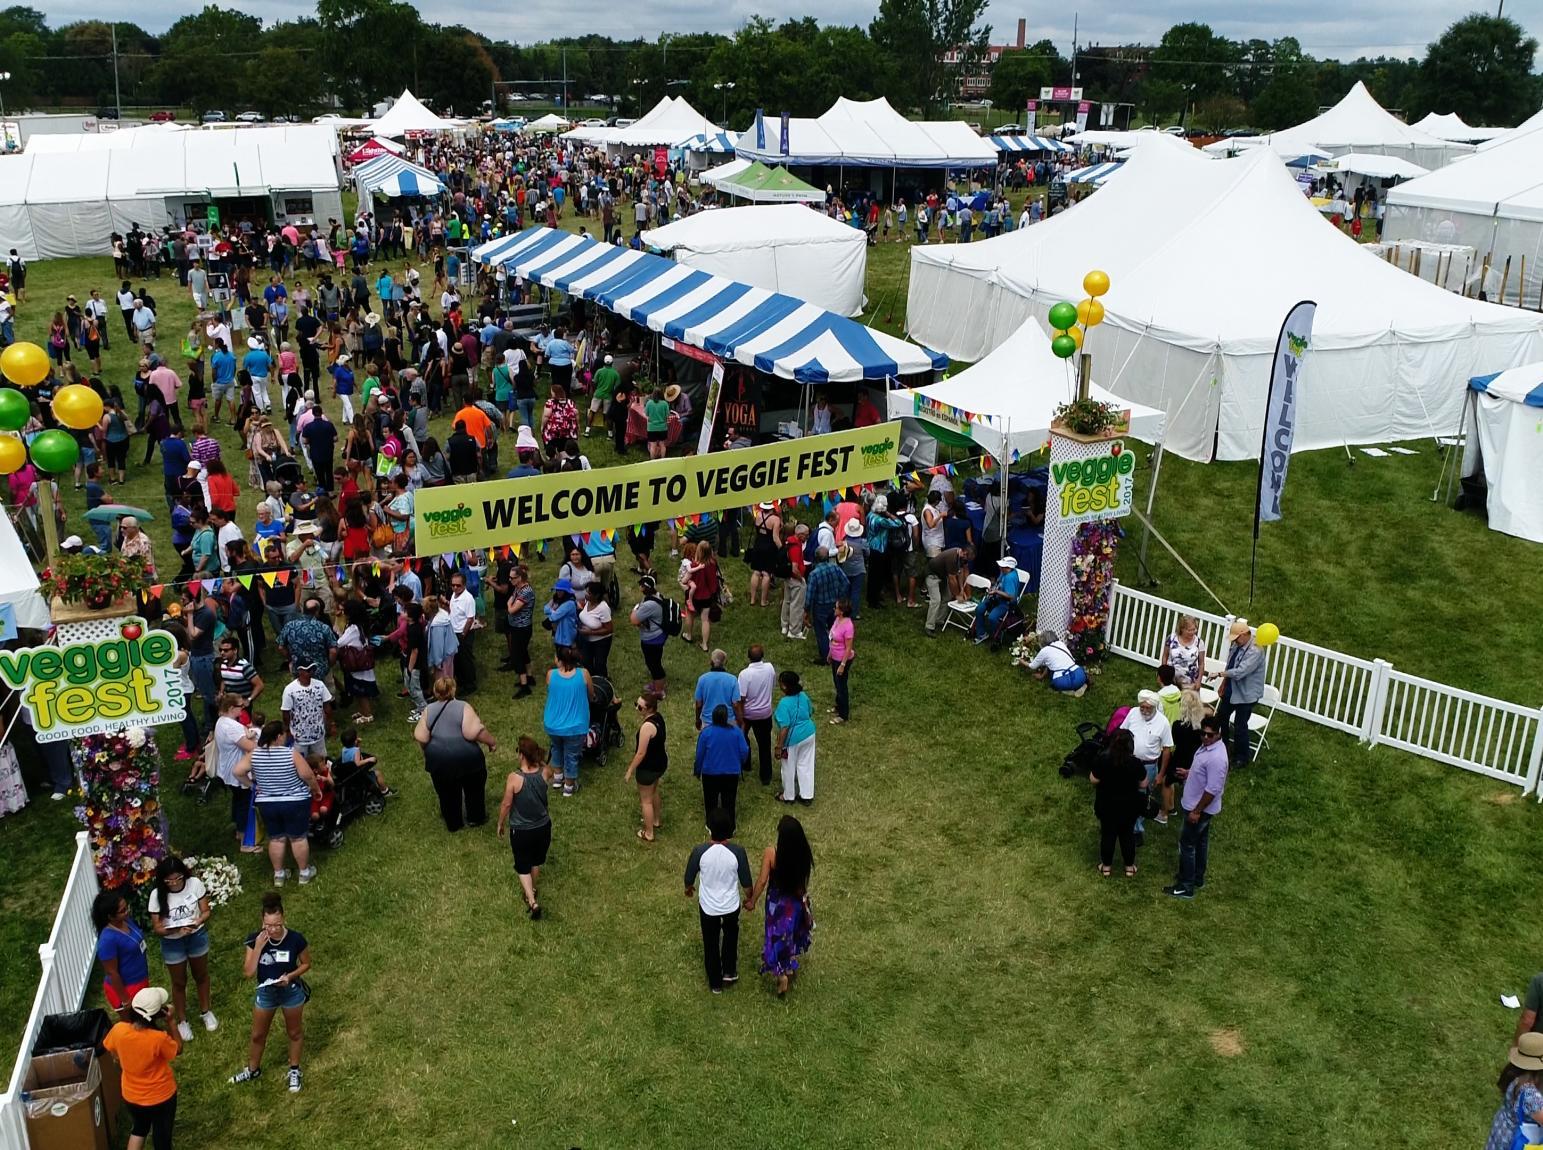 Crowd at Veggie Fest